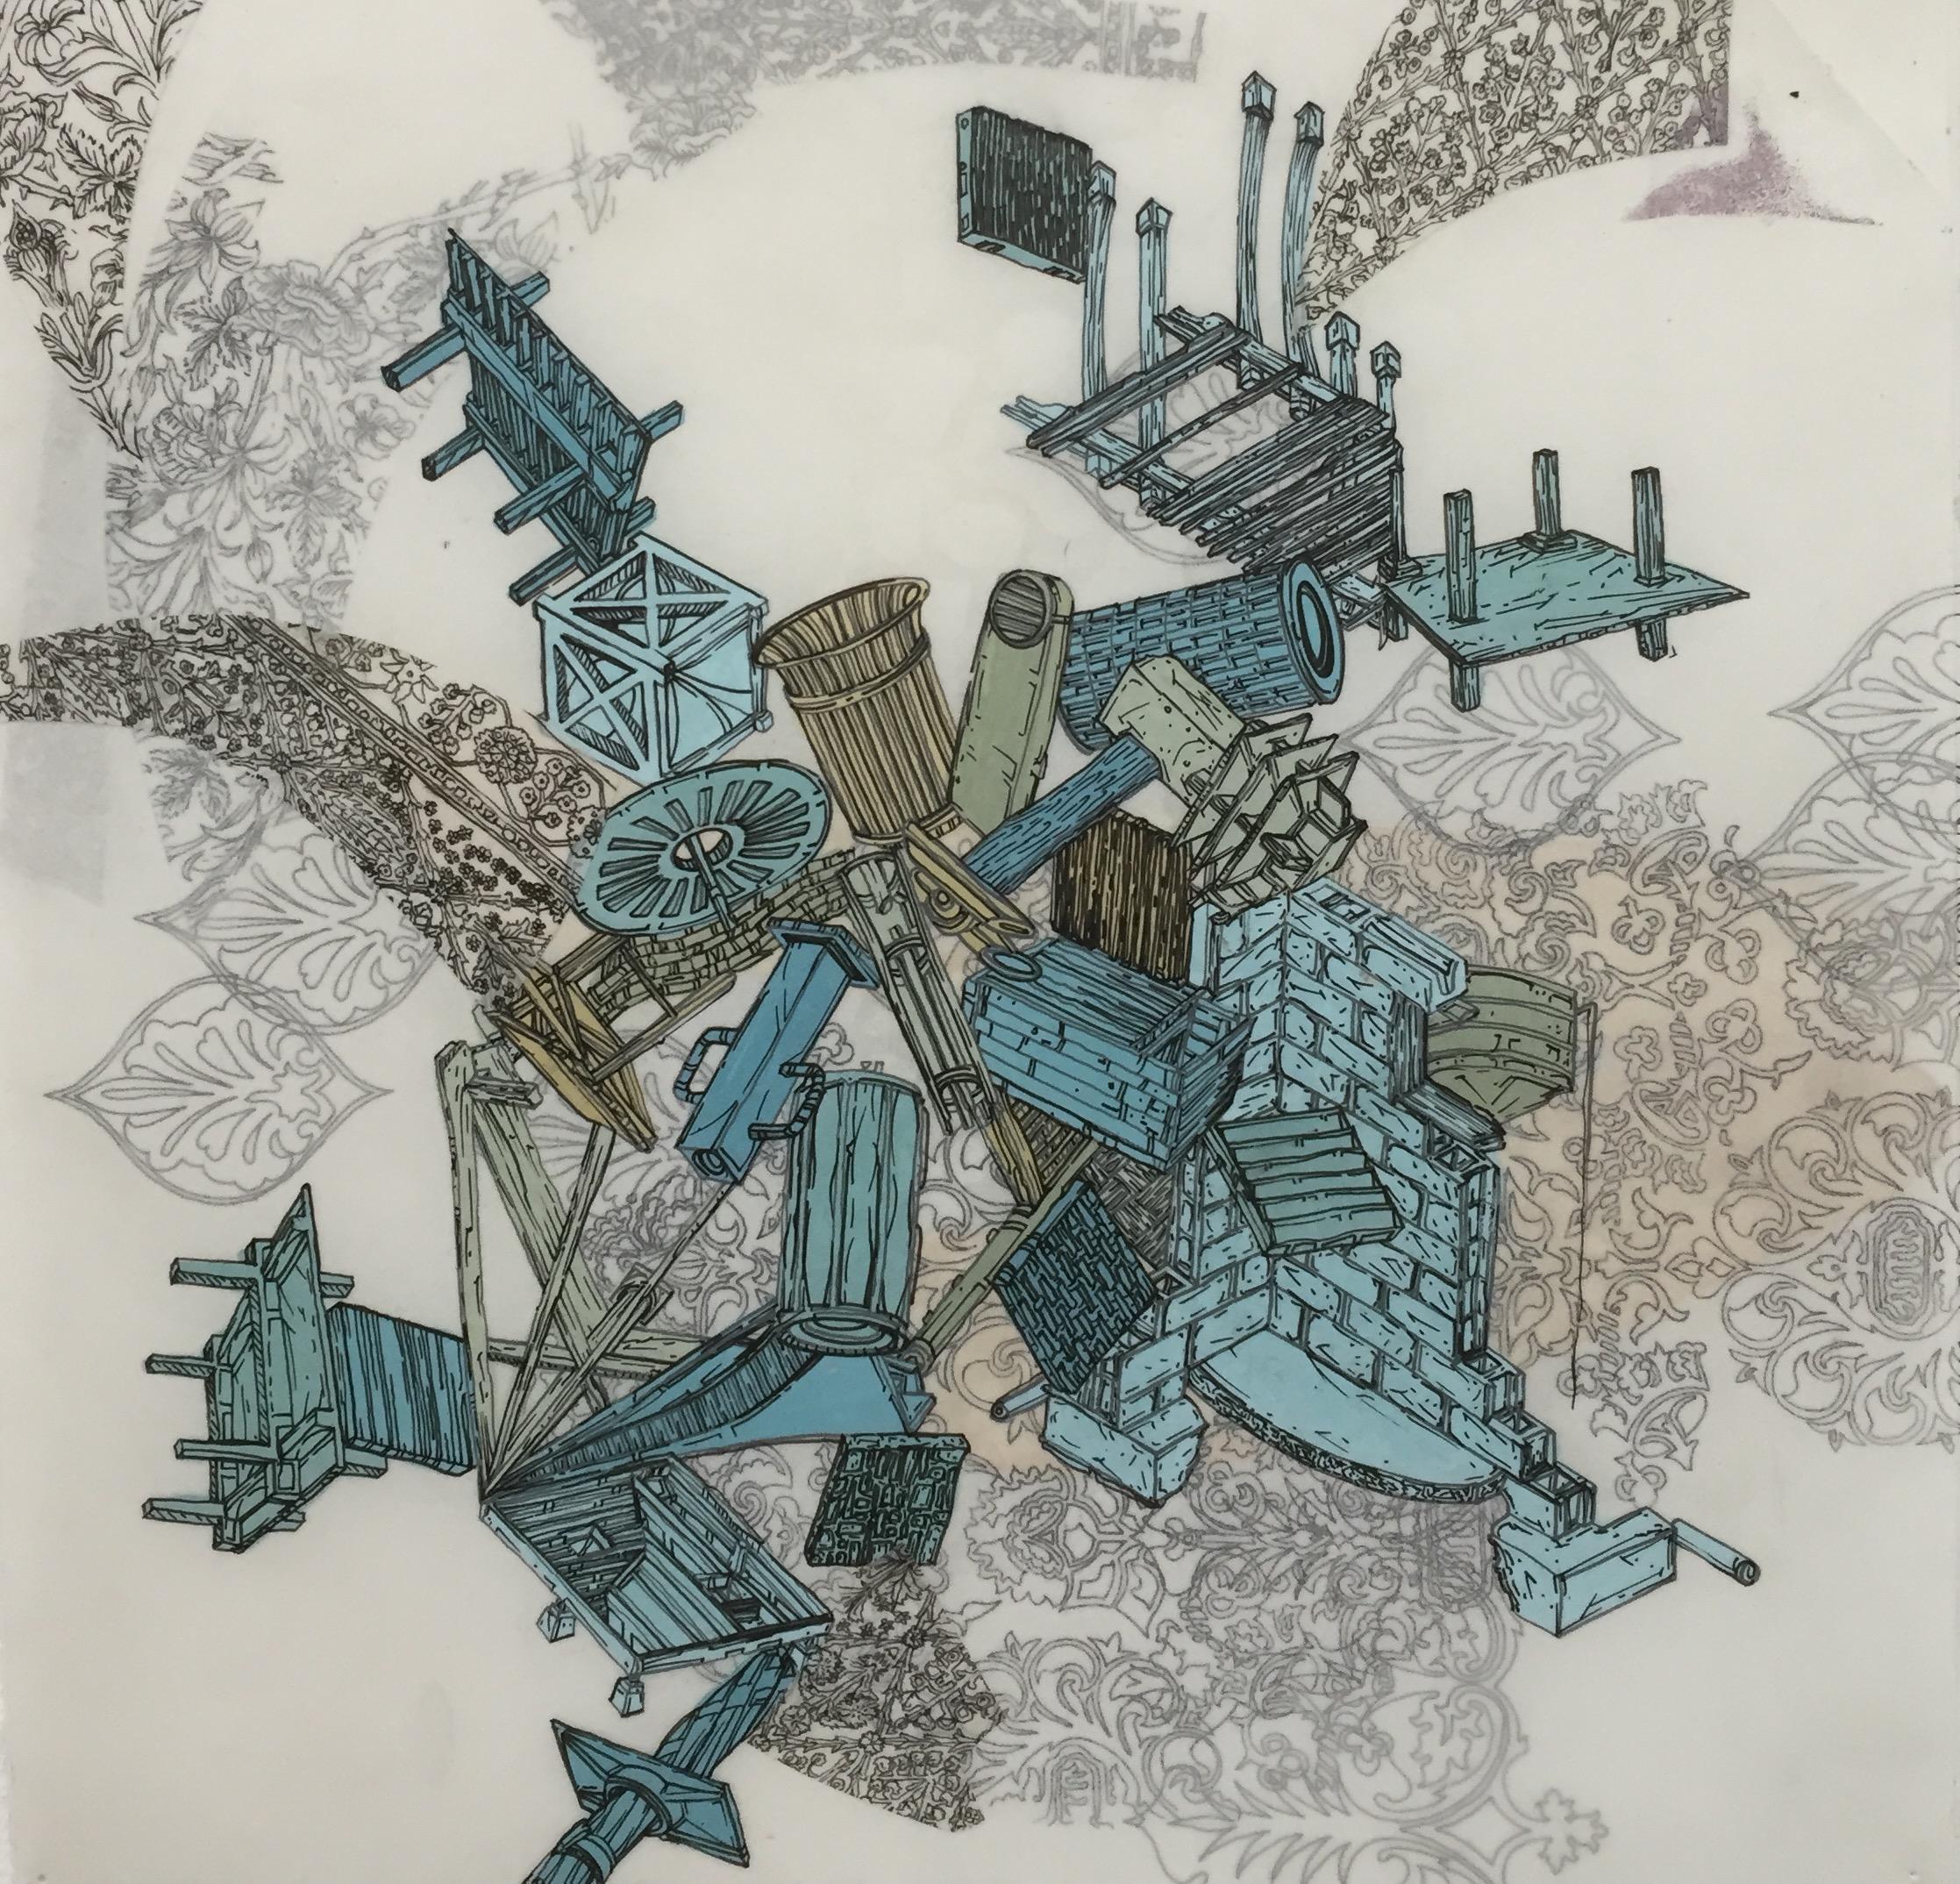 Constructions (detritus)